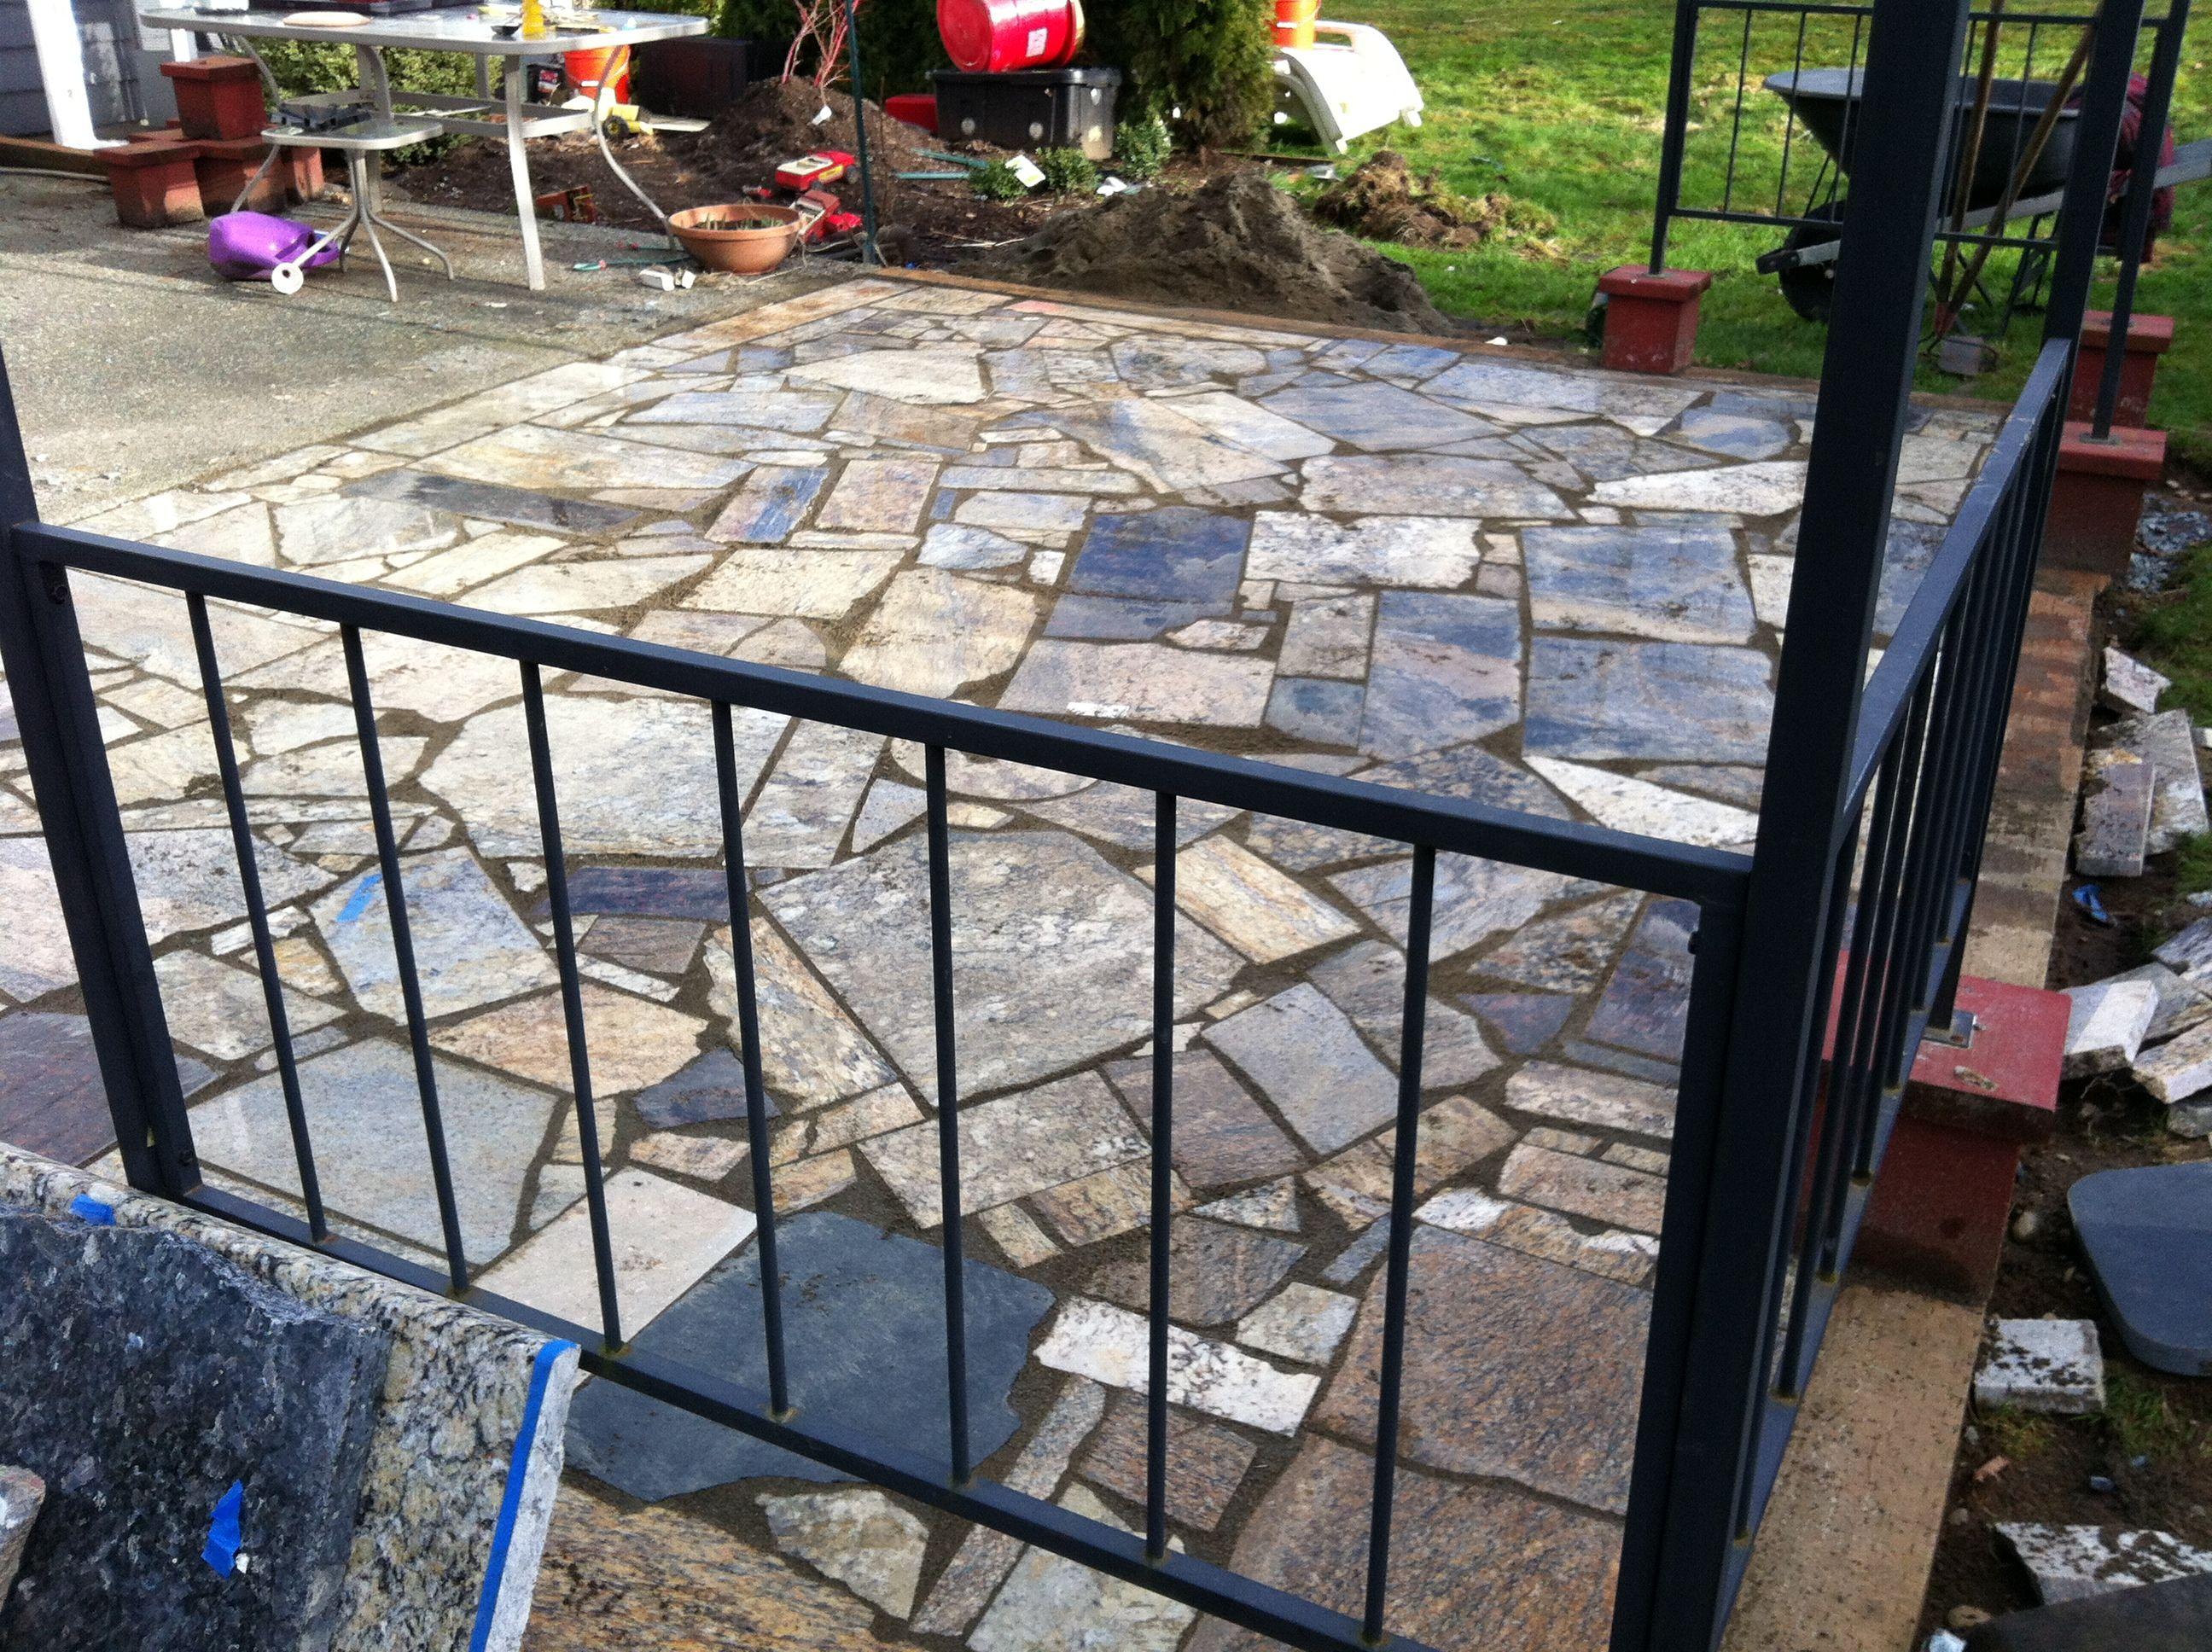 Granite Patio Made From Repurposed Kitchen Counter Scraps